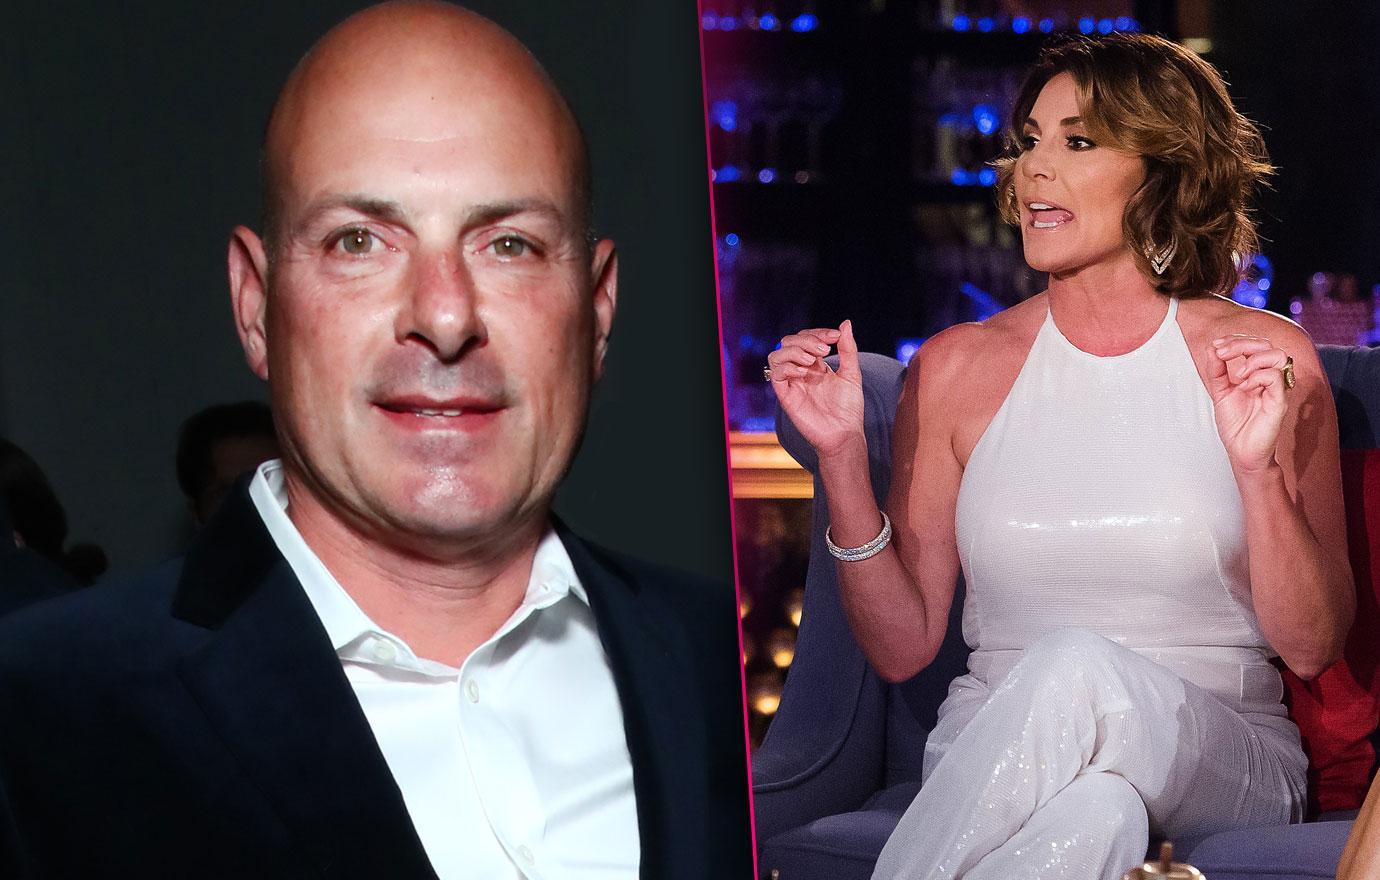 Tom D'Agostino Plotting Real Housewives Of New York Return Behind LuAnn de Lesseps-Back!